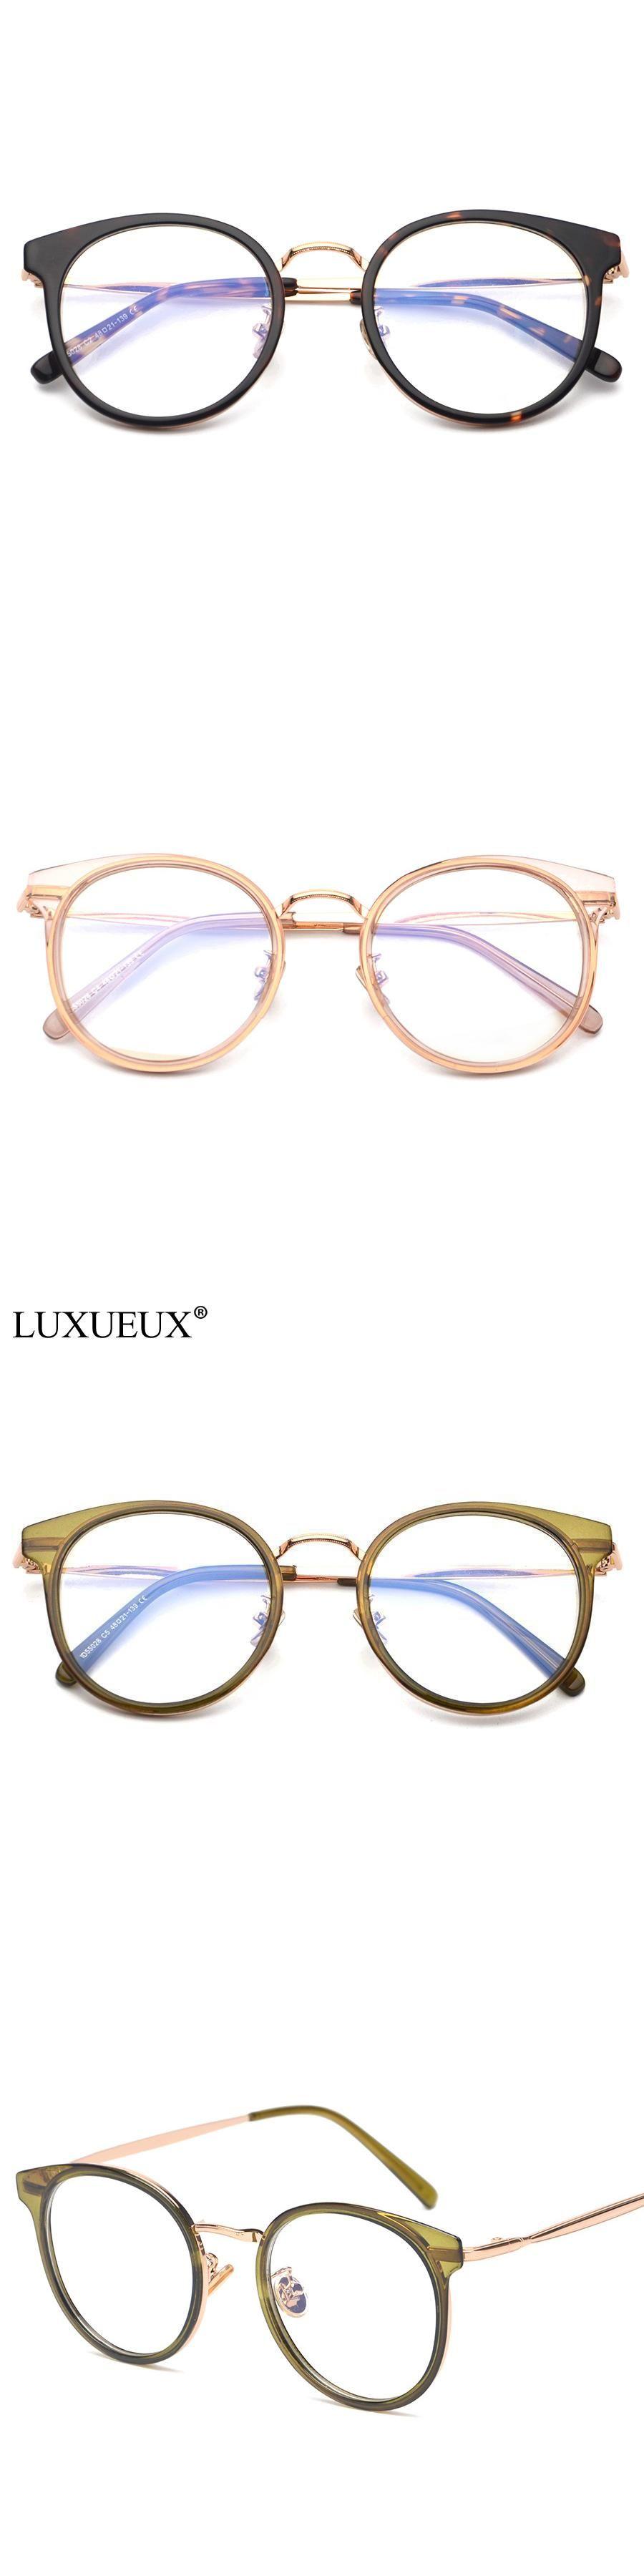 b451e8d0ef1 LUXUEUX New Arrival Retro Transparent Clear Lens Myopia Reading Glasses  Round Flat Mirror Frame Female TR90 Harajuku Eyeglasses